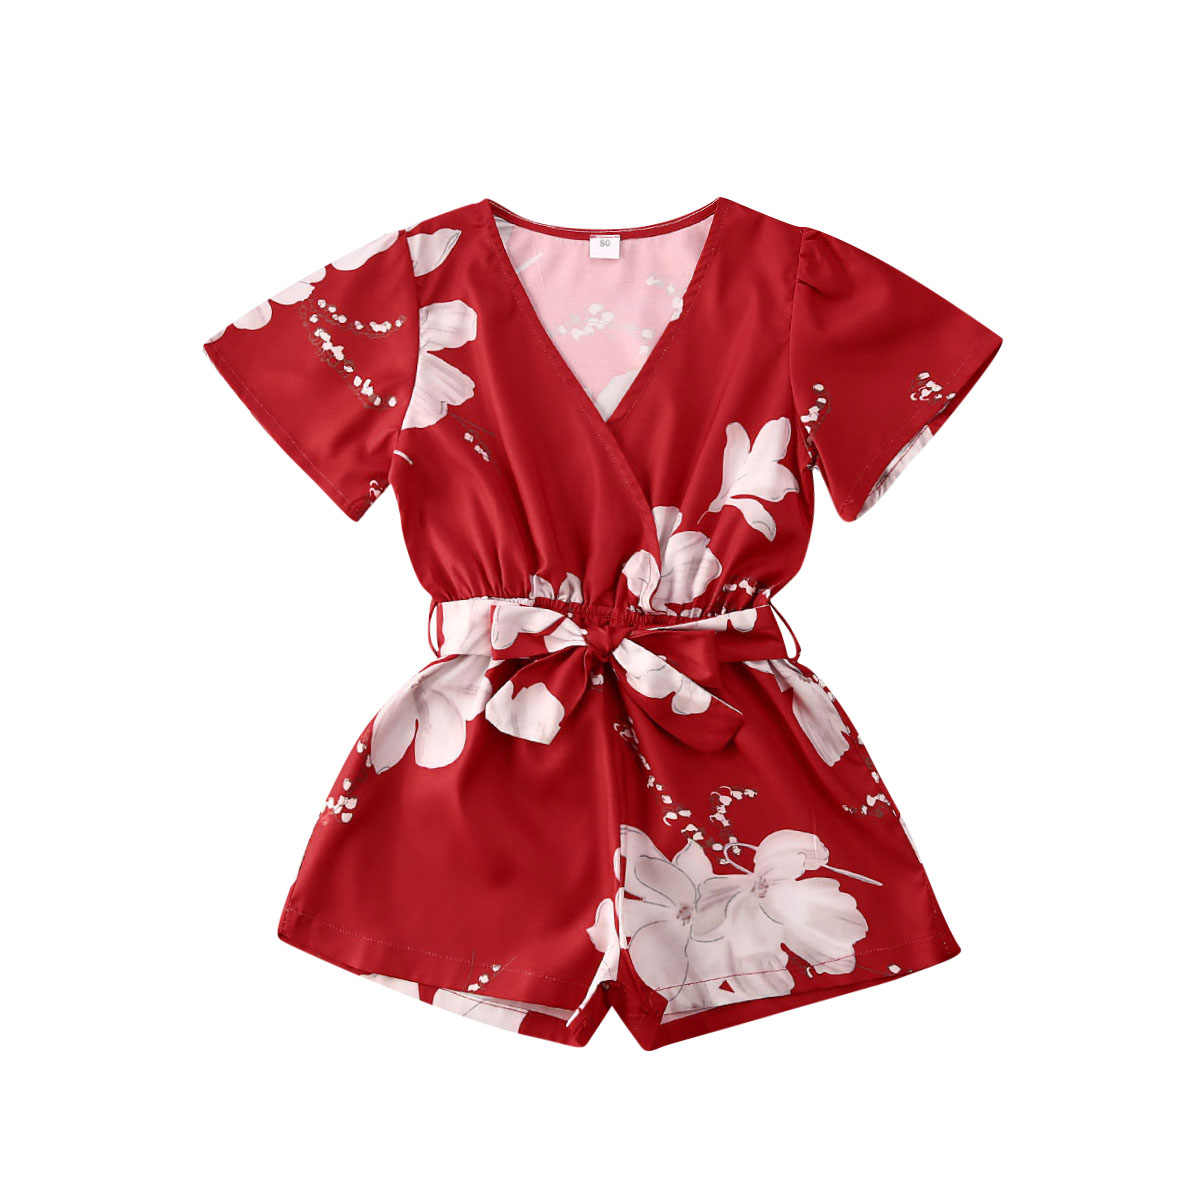 Summer Baby Boys Girl Kids Short Sleeve Heart Print Romper Round Collar Jumpsuit